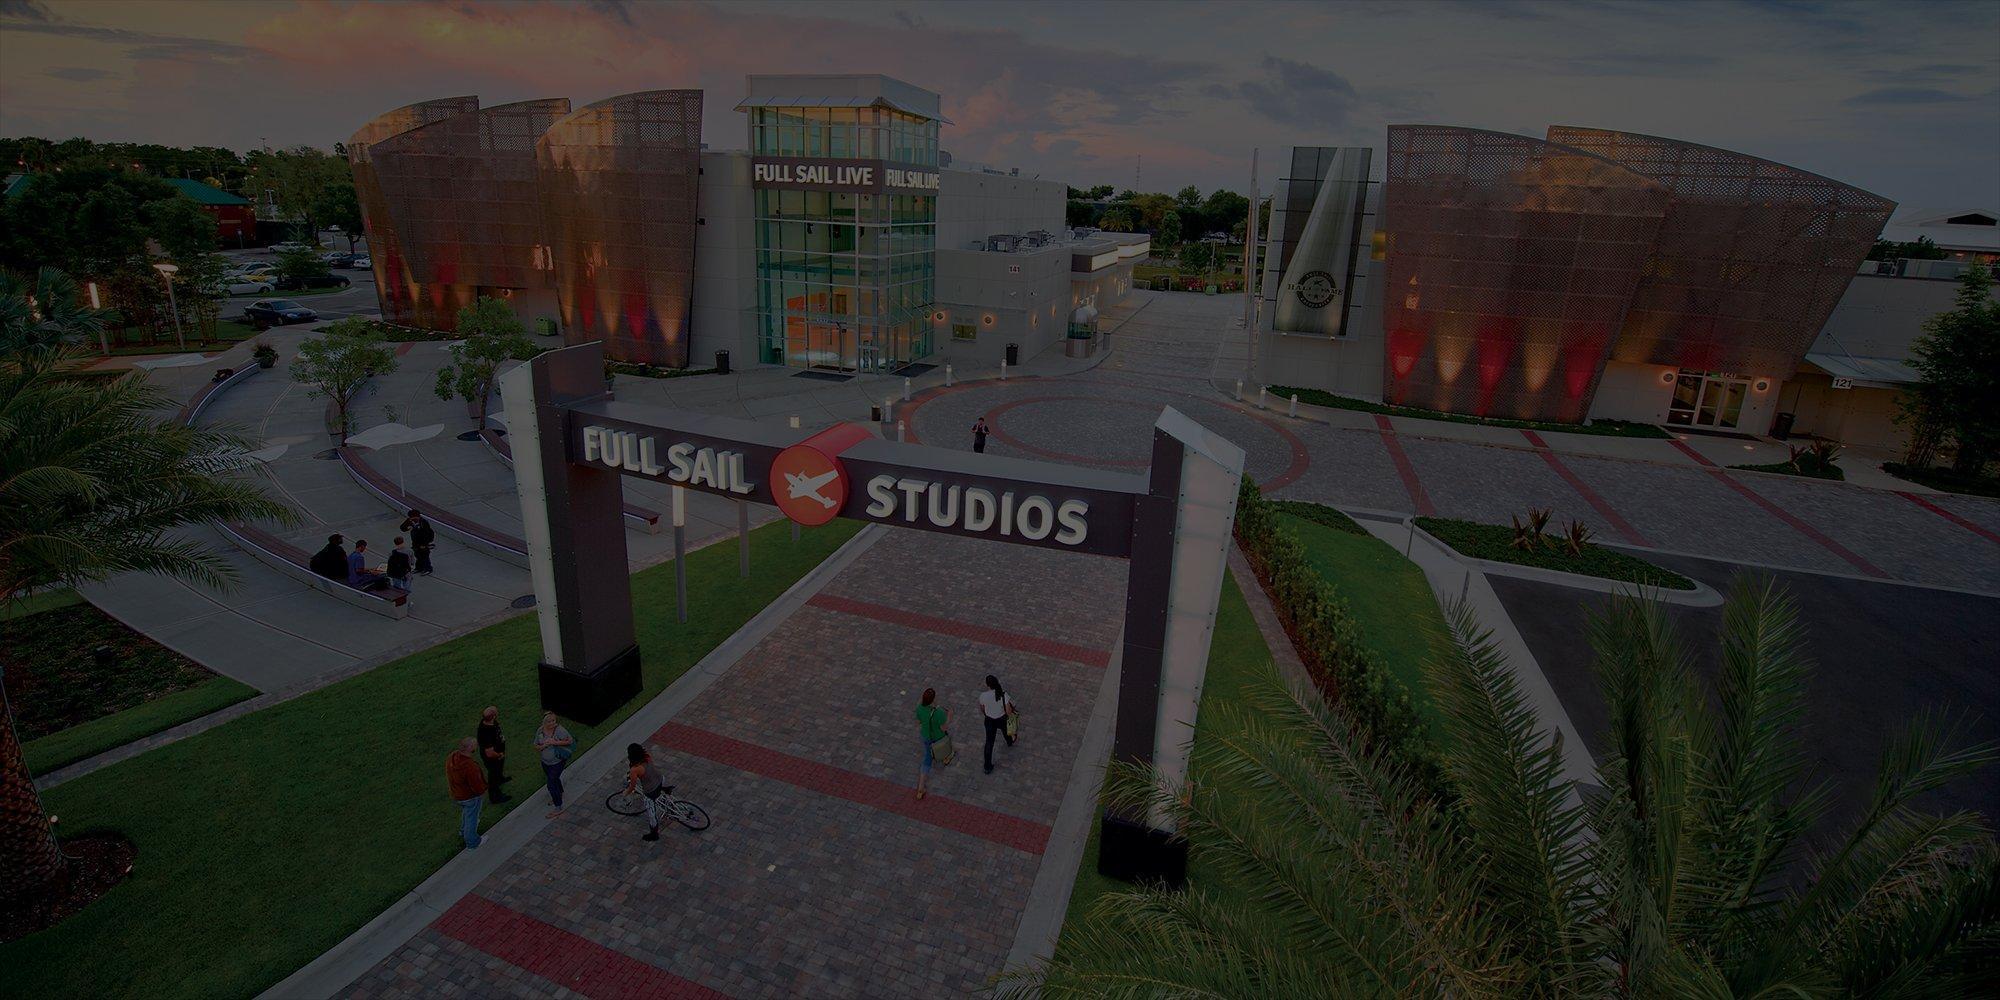 Curator Chats - Florida International University